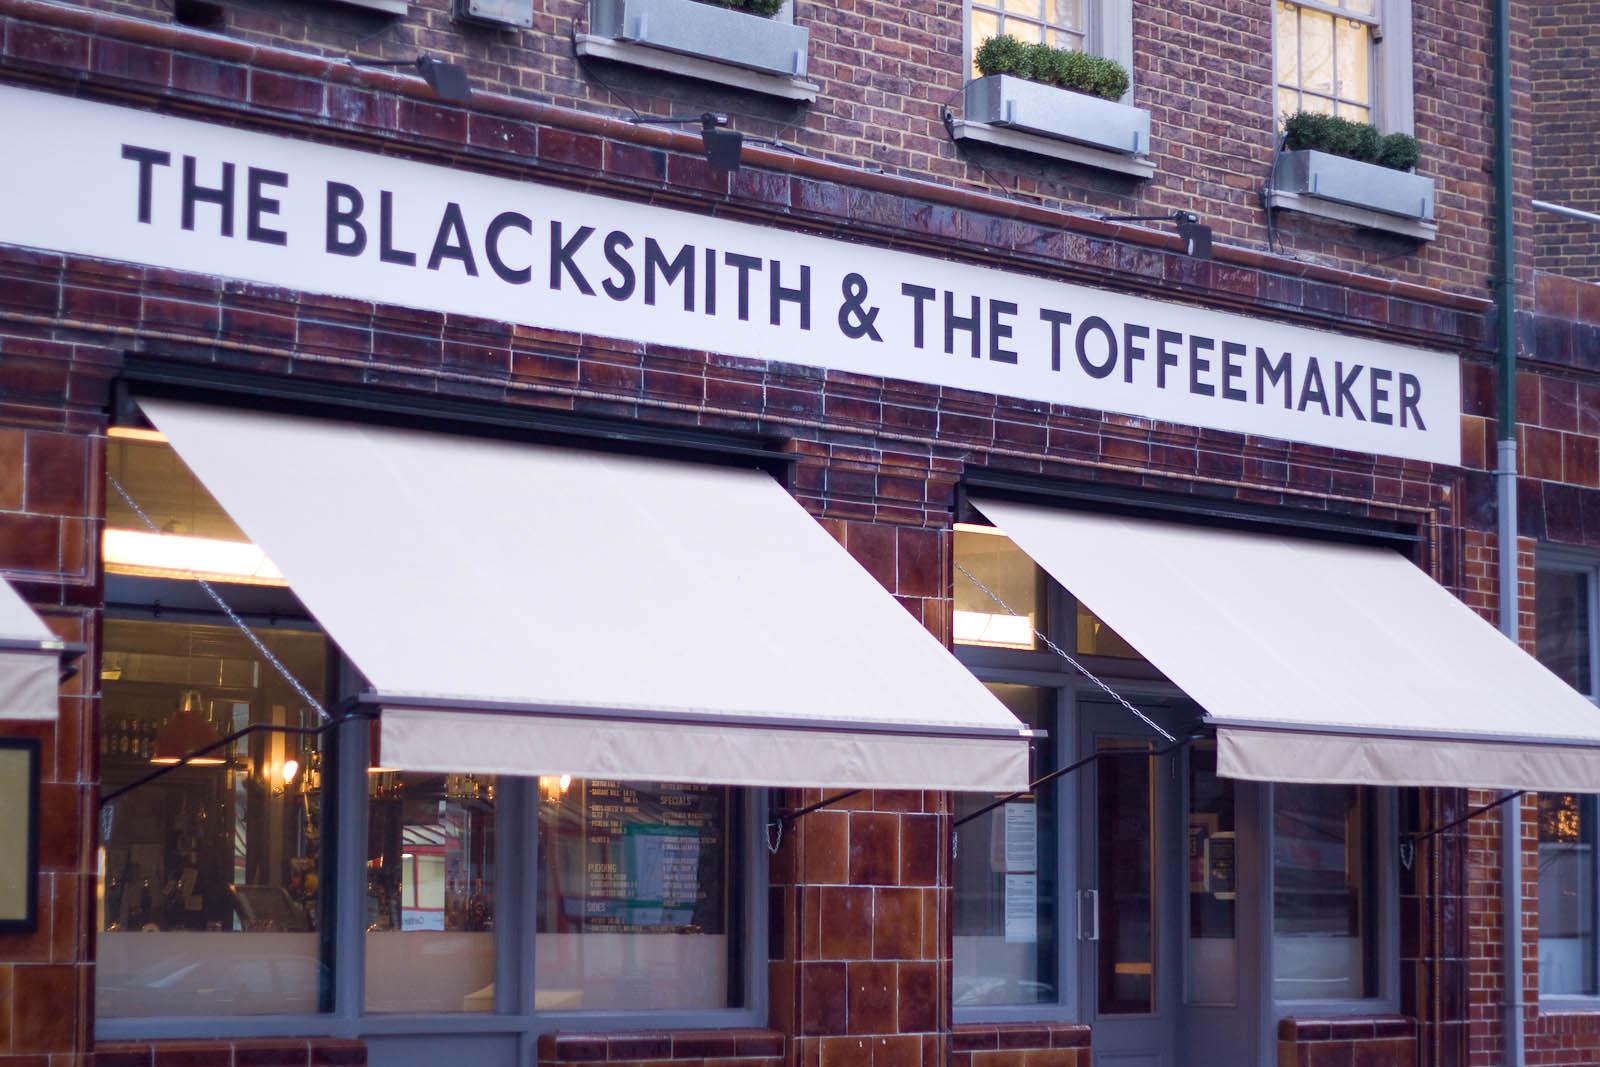 theblacksmith&thetoffeemaker.jpg